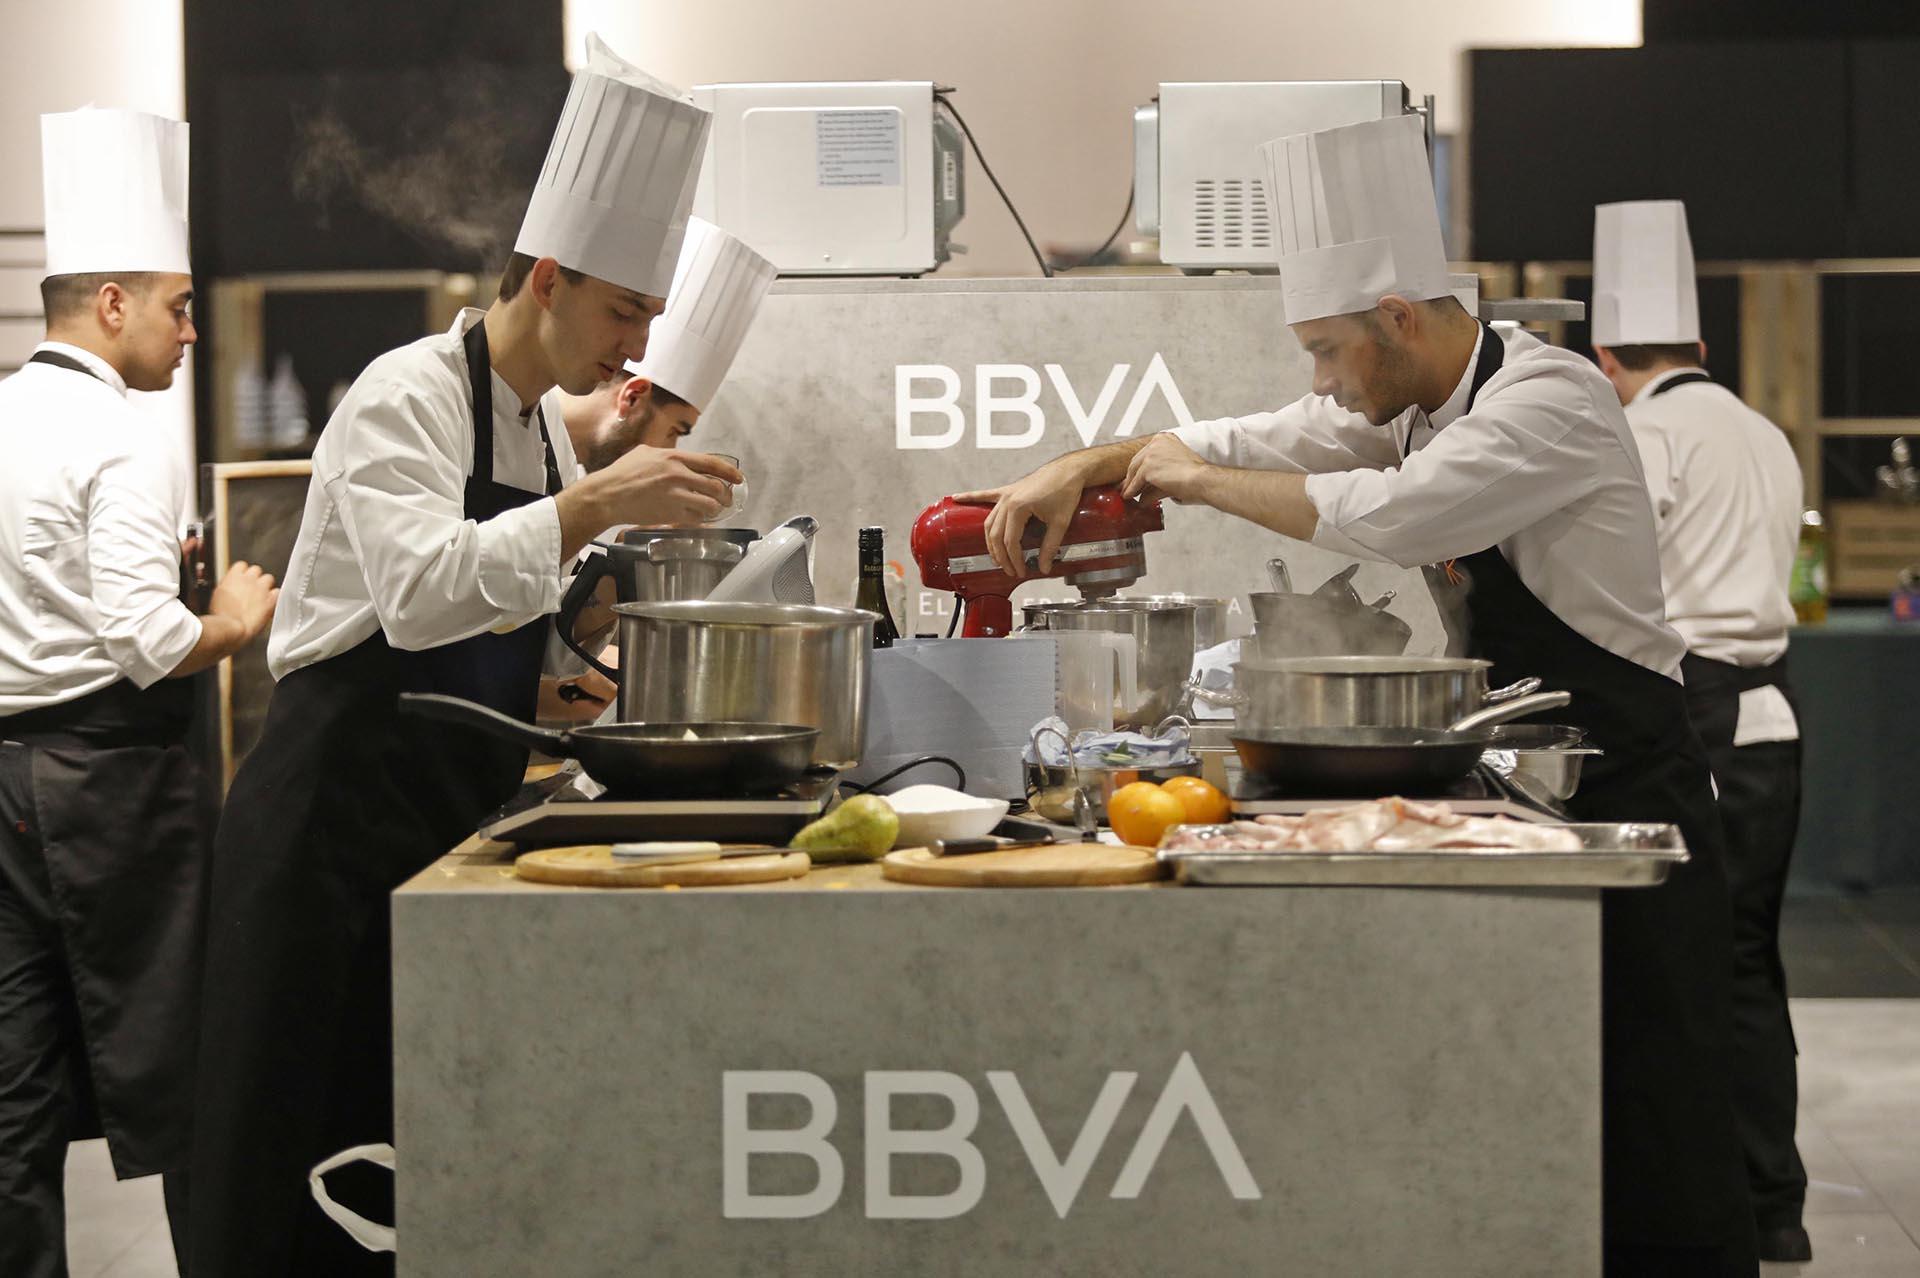 Event awards BBVA hospitality scholarships. kitchen design and construction